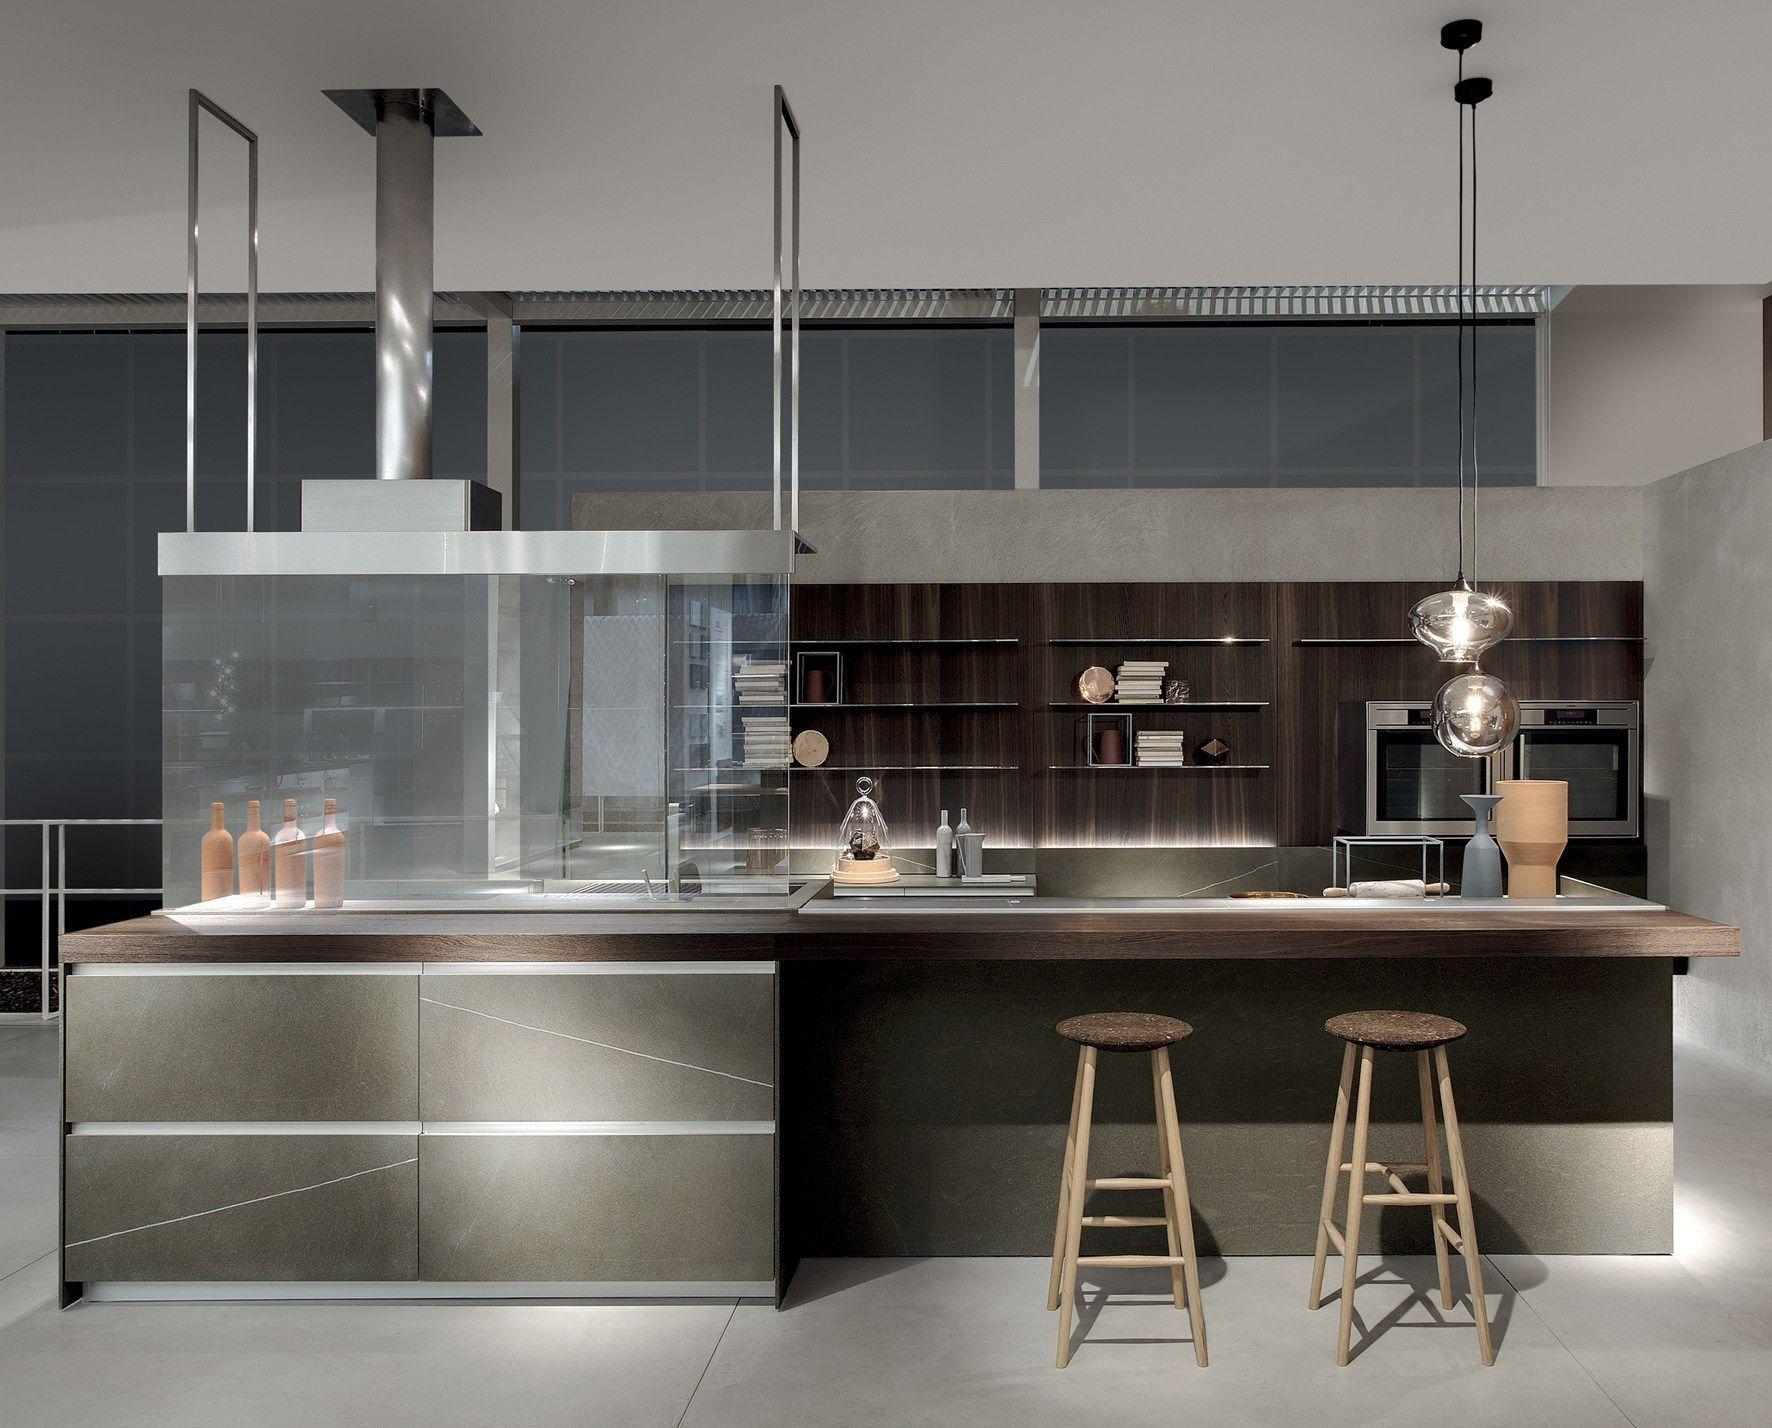 Cucina senza maniglie ICON by ERNESTOMEDA | design Giuseppe Bavuso ...